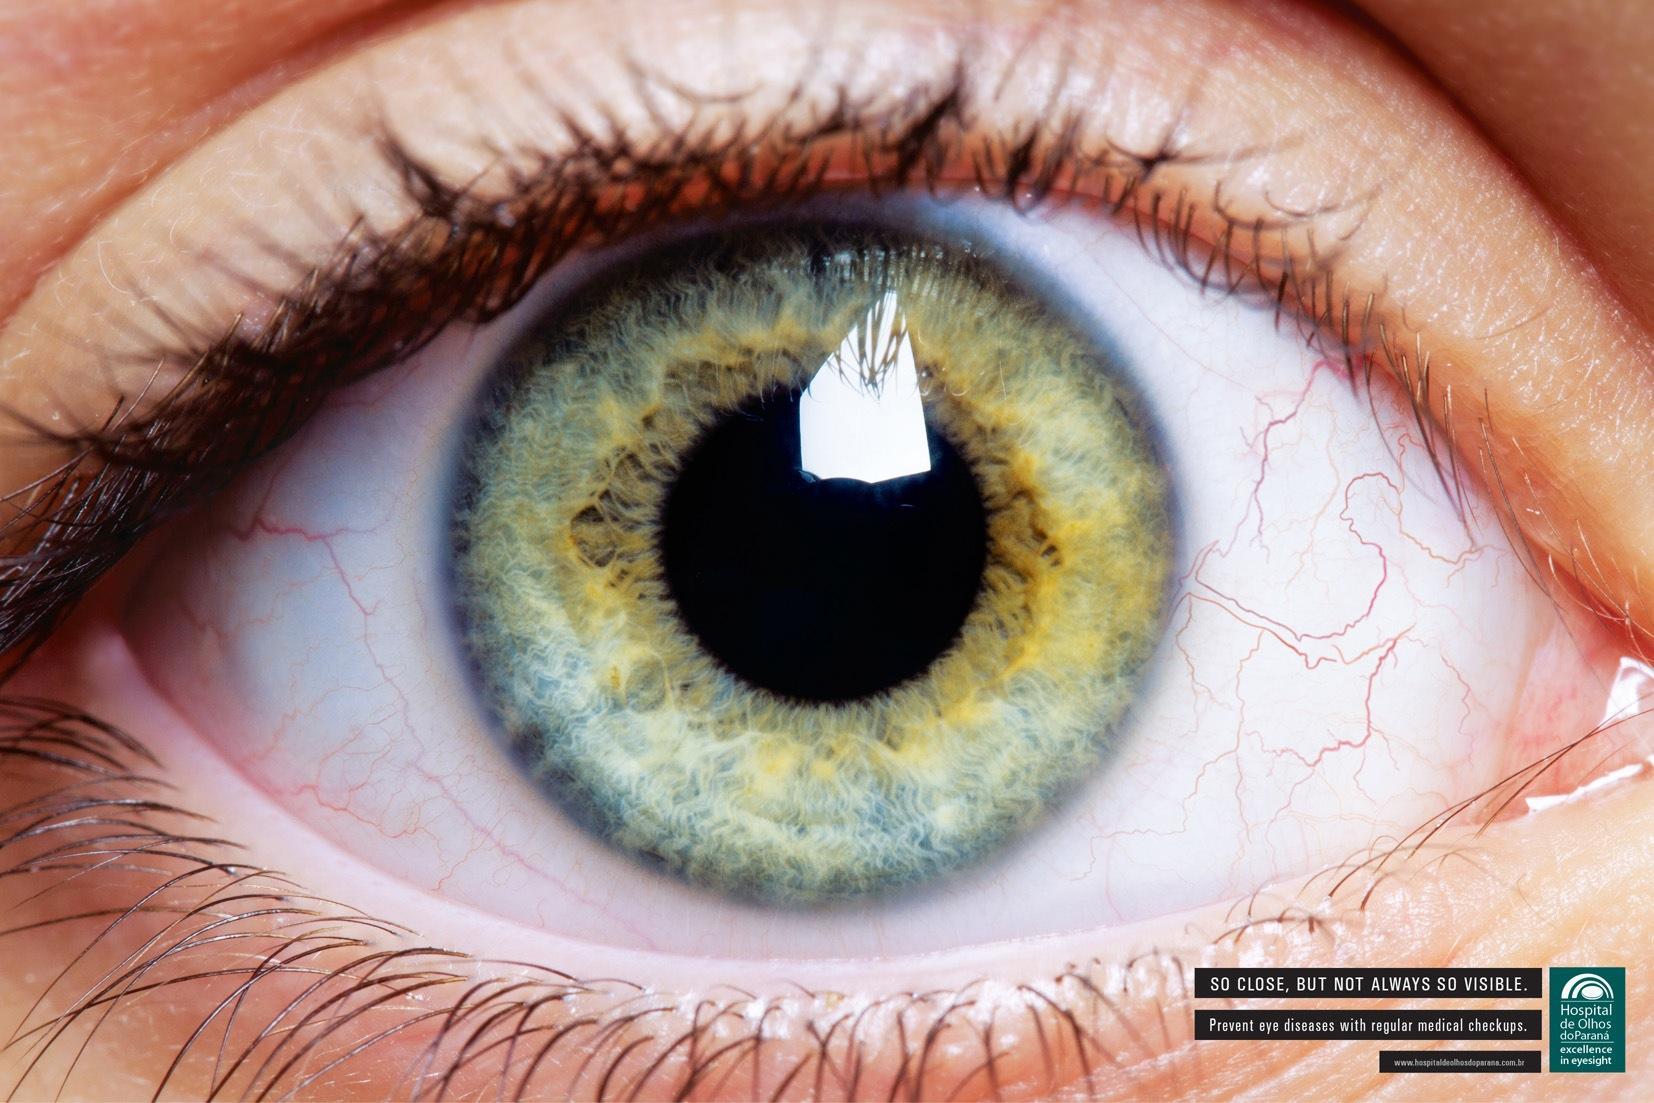 Hospital de Olhos do Paraná Print Ad -  Eye, 1